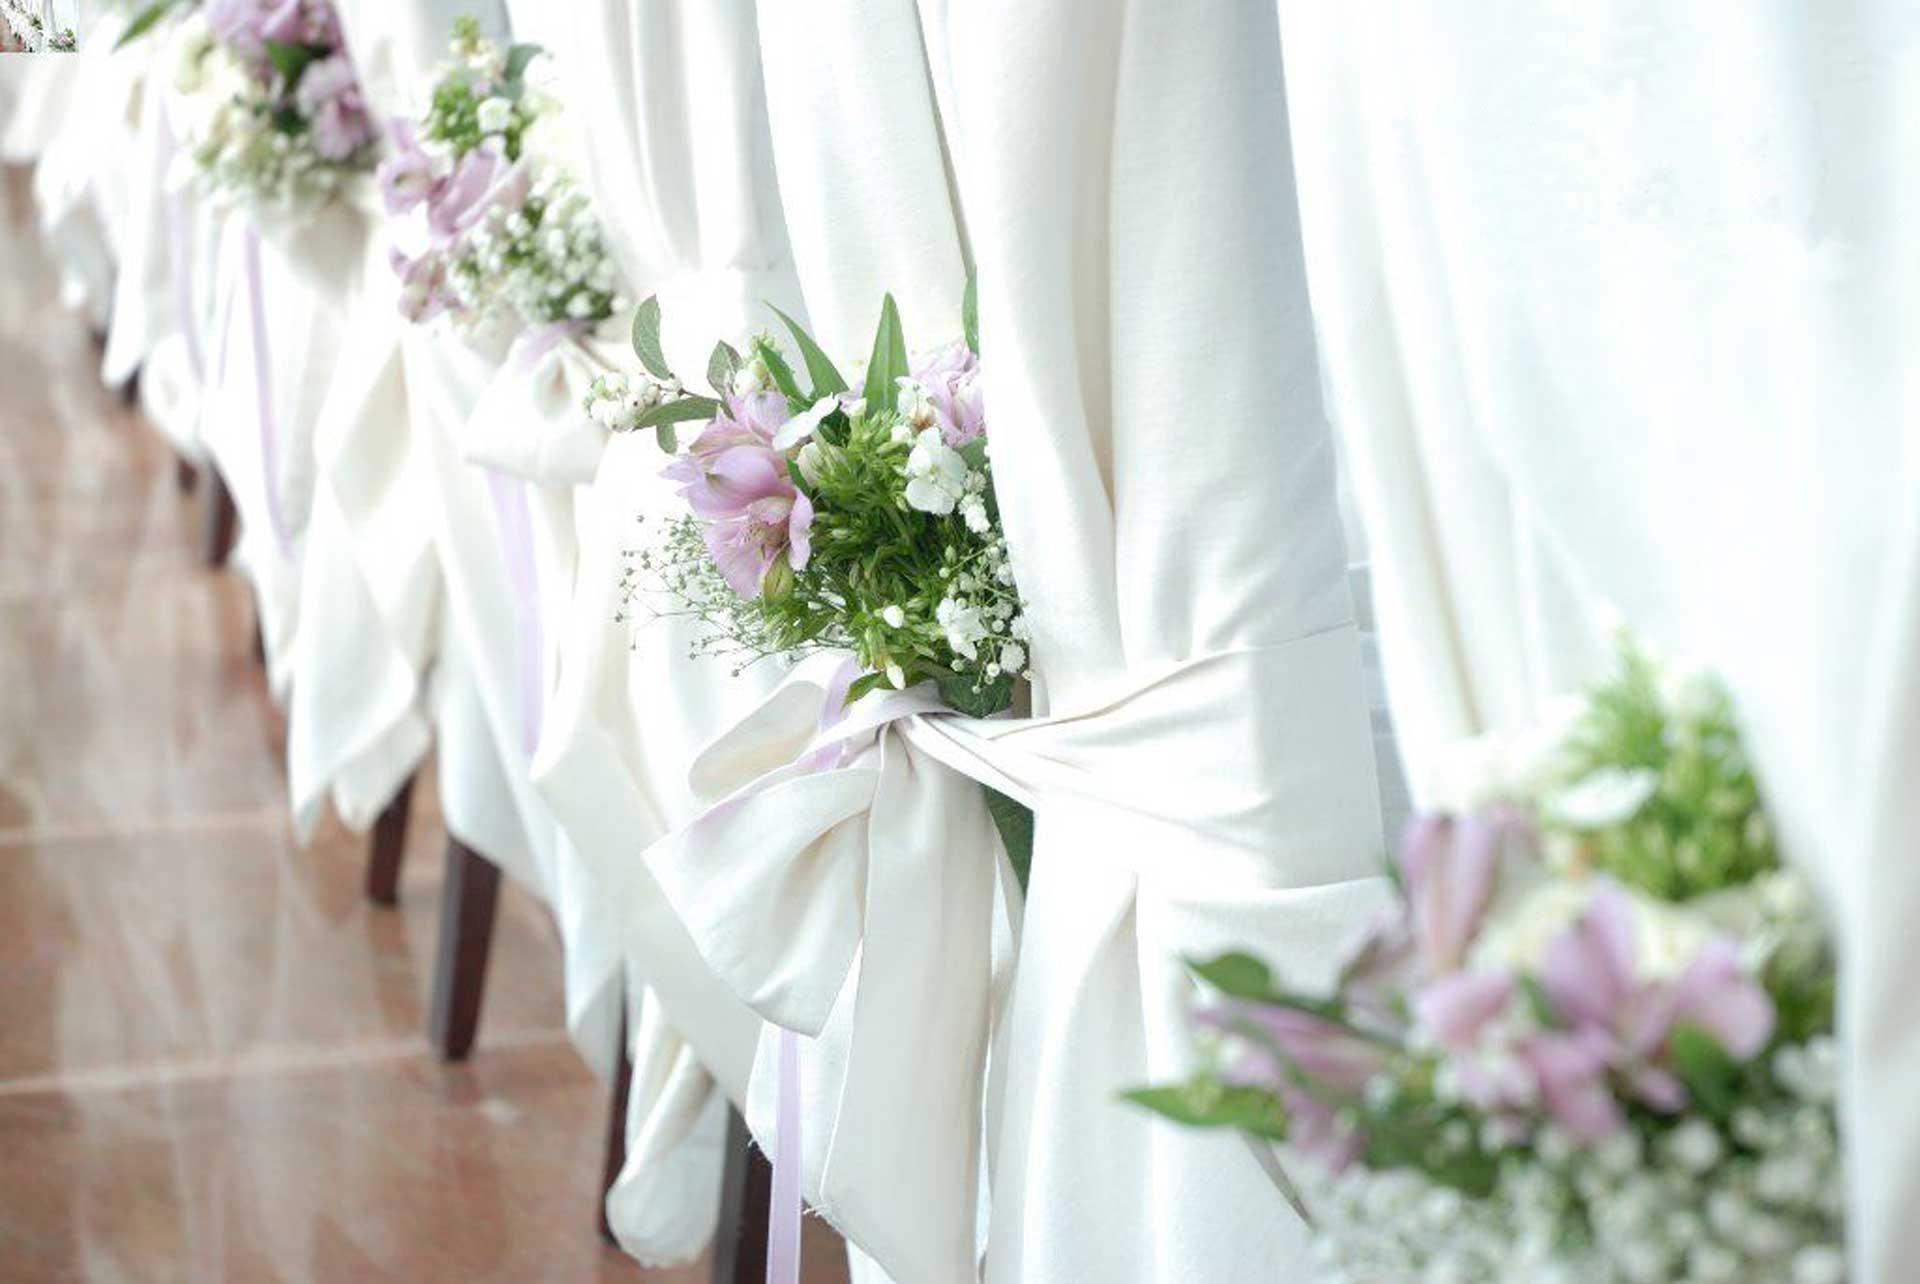 Arreda la casa in stile shabby. Matrimonio Shabby Chic Maan Banqueting Catering Roma Frascati